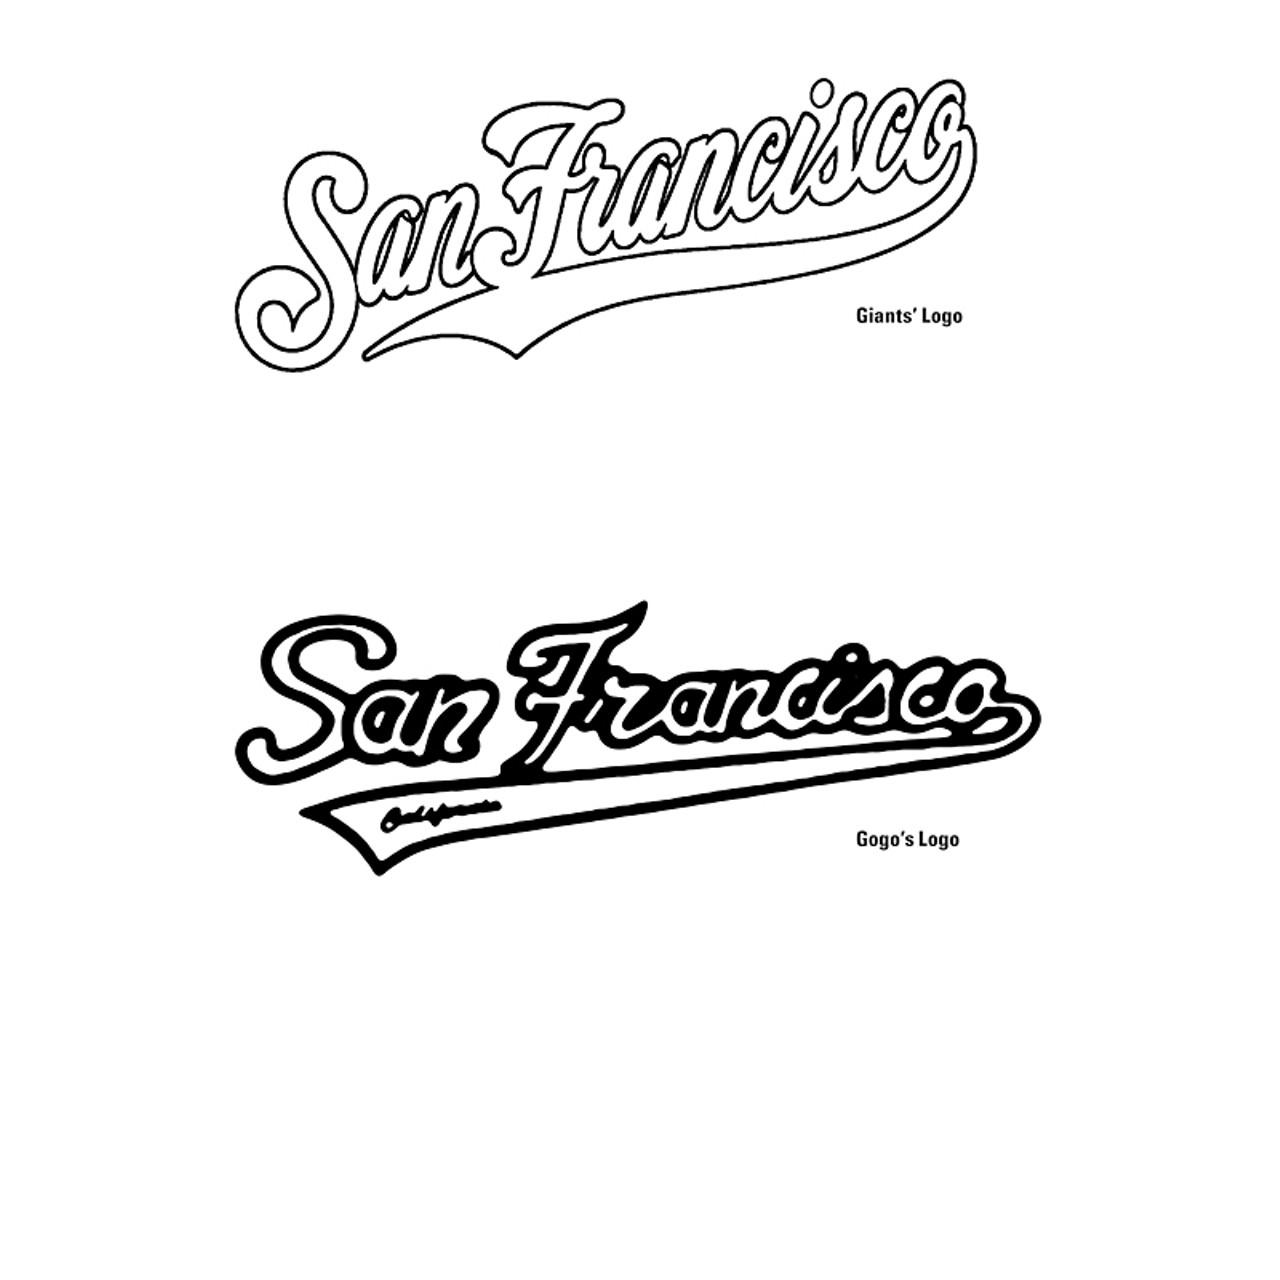 giants get sued over team s san francisco logo sucka free city